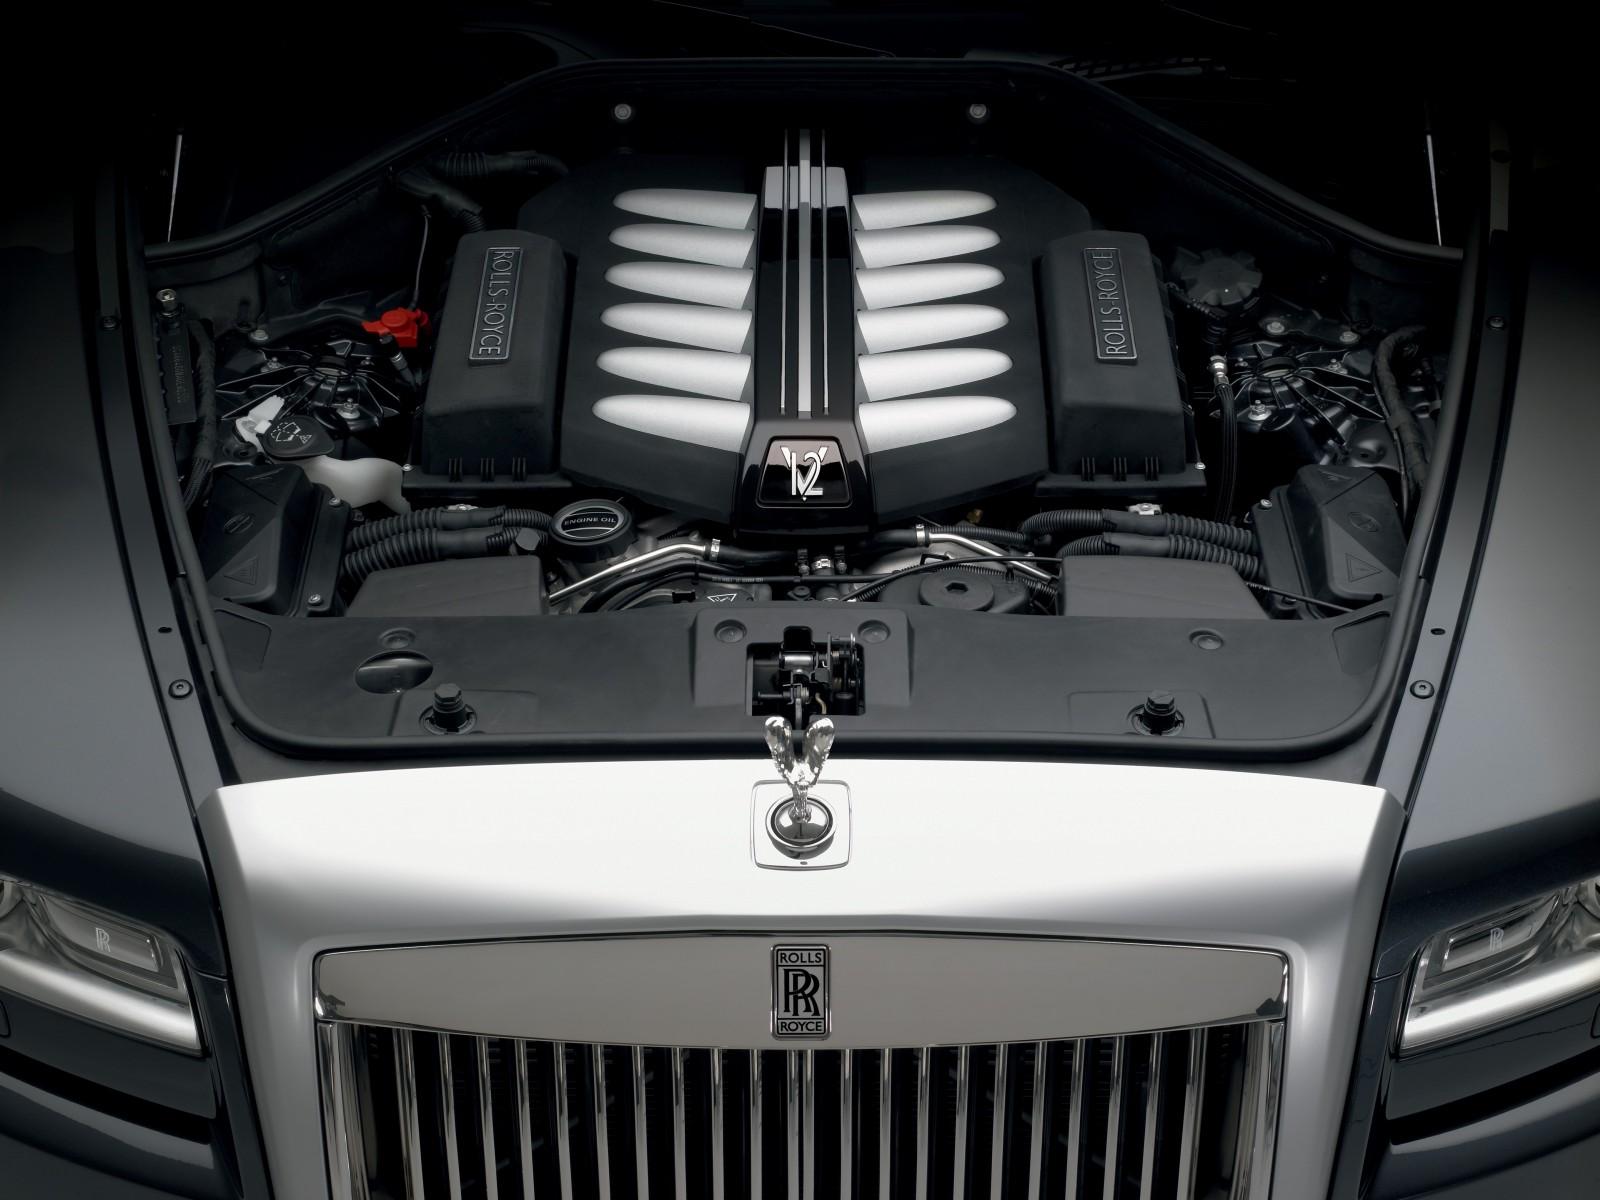 http://1.bp.blogspot.com/-ubb8A-TIdC8/TbceSvbOEDI/AAAAAAAAQUI/ty3XXCTbxSo/s1600/2010-Rolls-Royce-Ghost-09-1600x1200.jpg